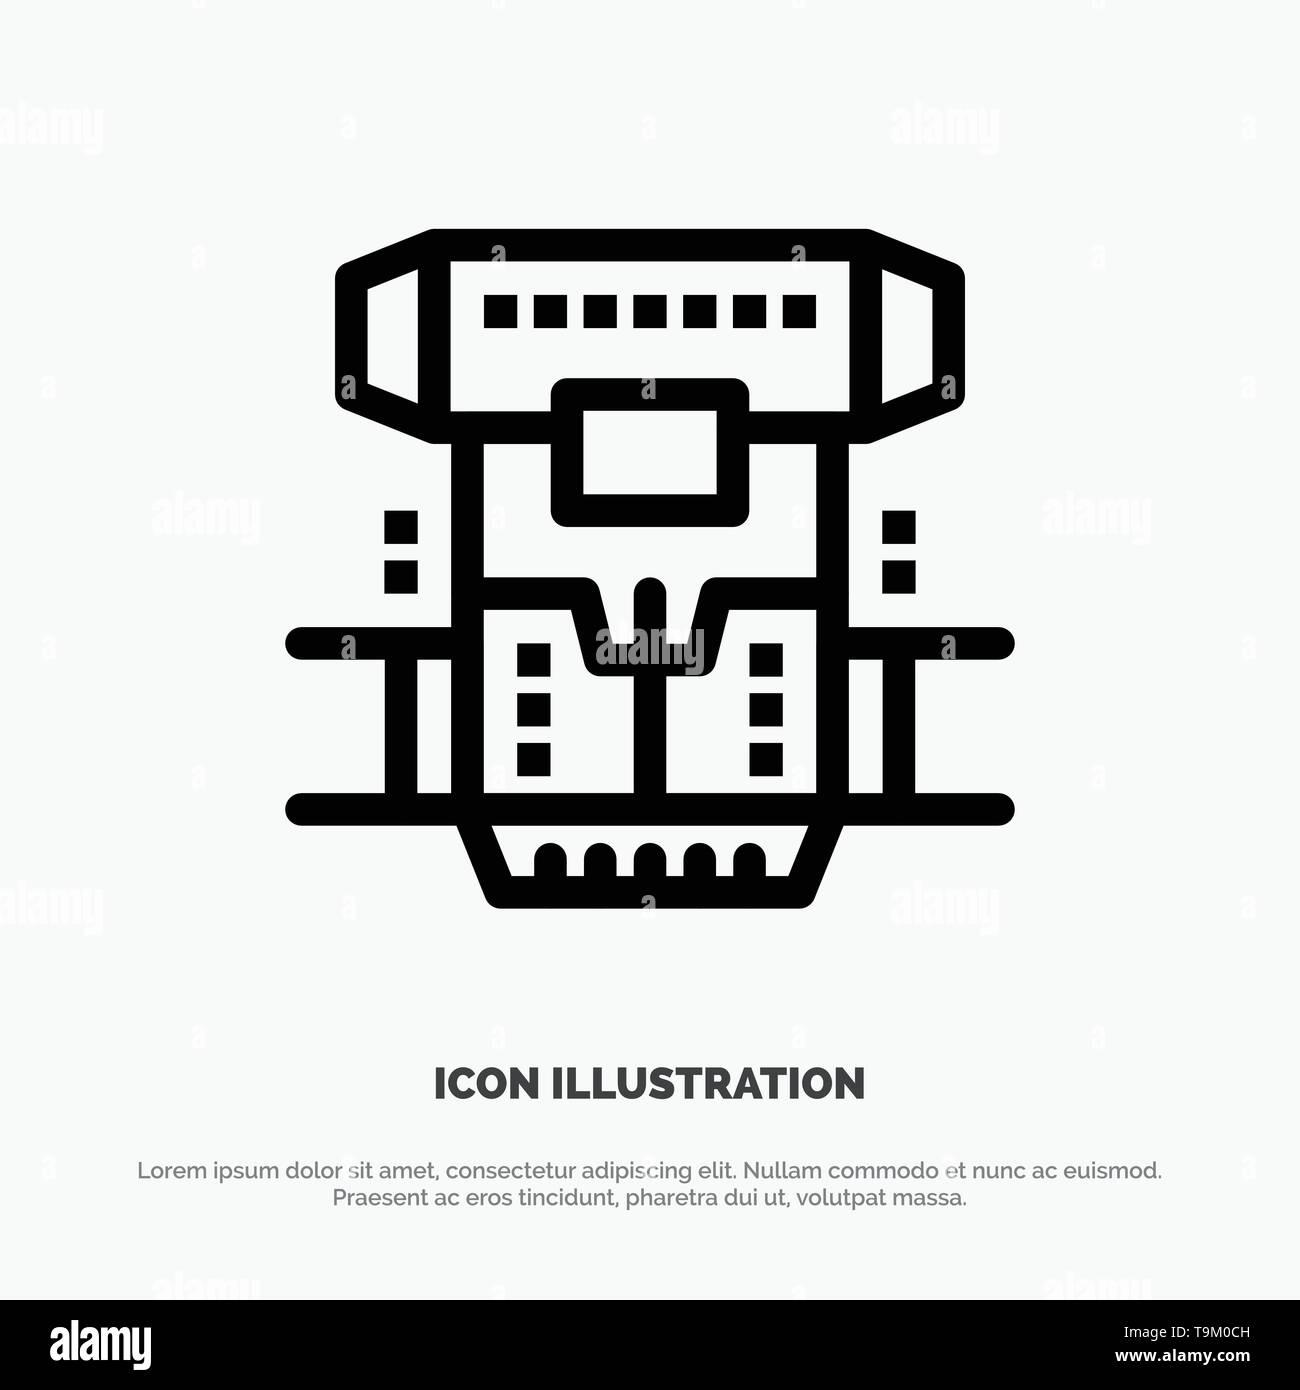 Box, Chamber, Cryogenic, Cryonics, Cryotherapy Line Icon Vector - Stock Image